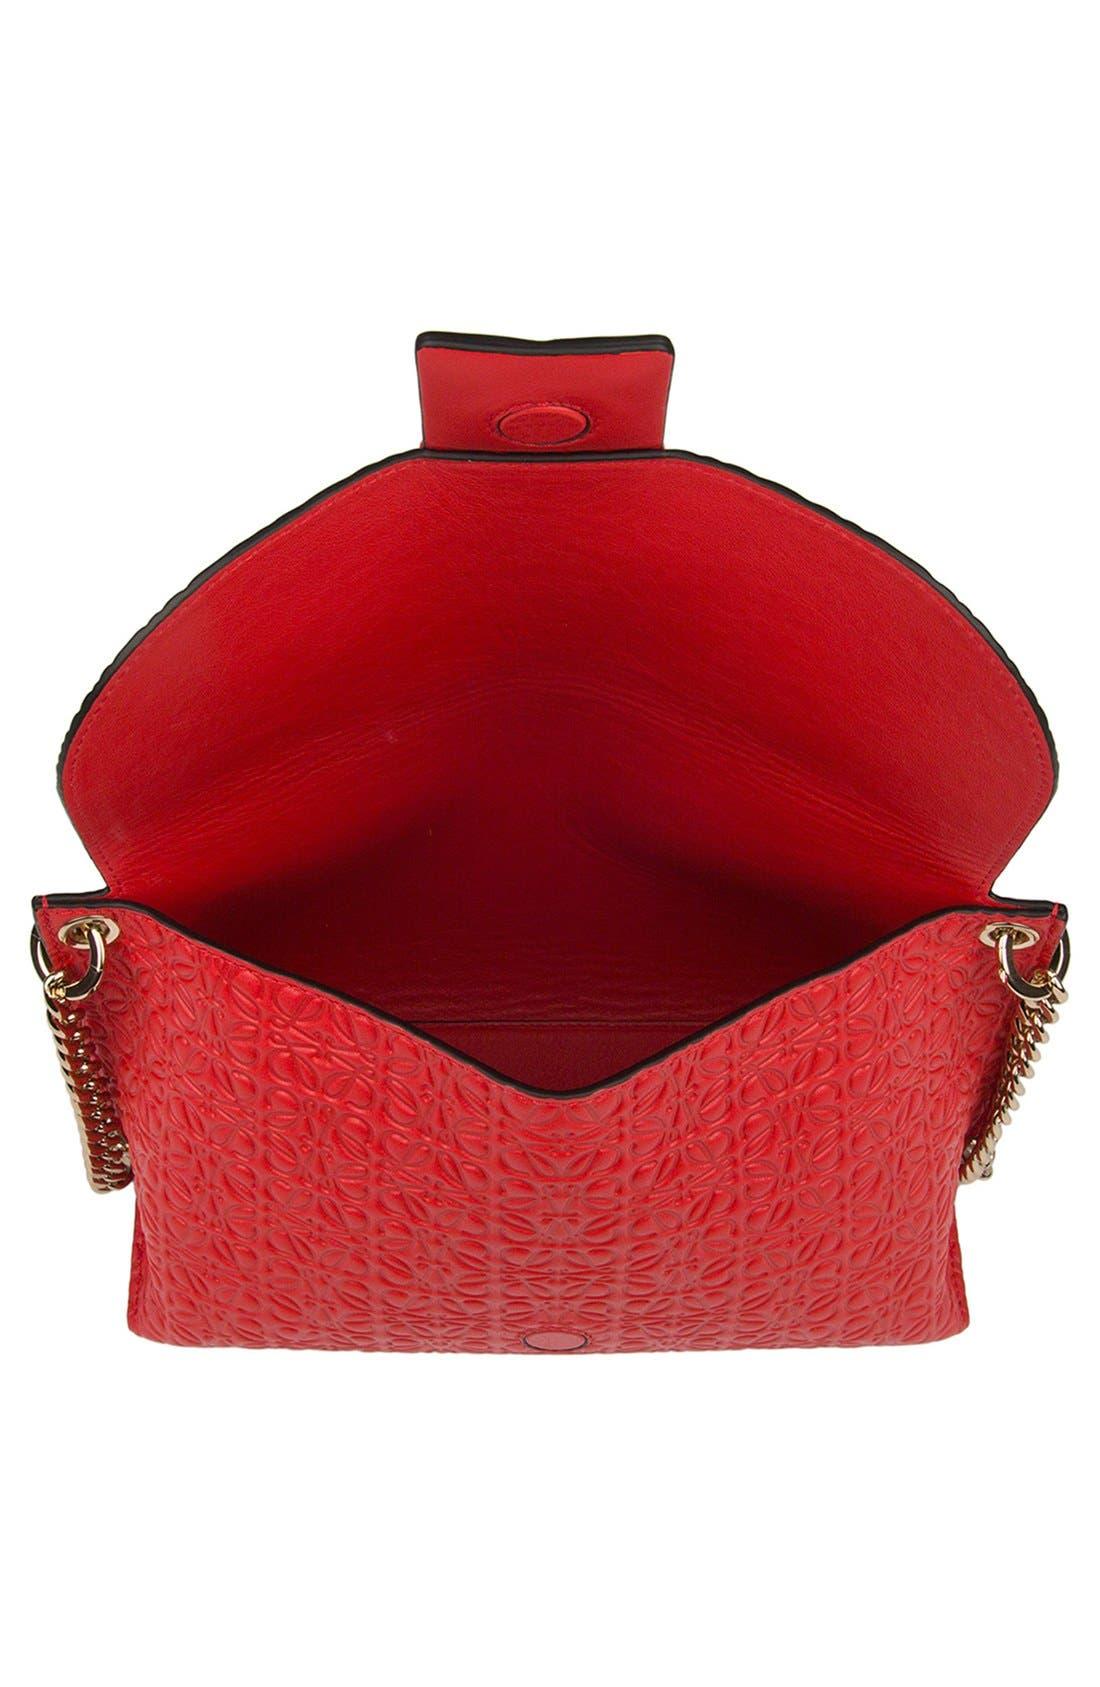 Alternate Image 3  - Loewe 'Avenue' Embossed Calfskin Leather Crossbody Bag